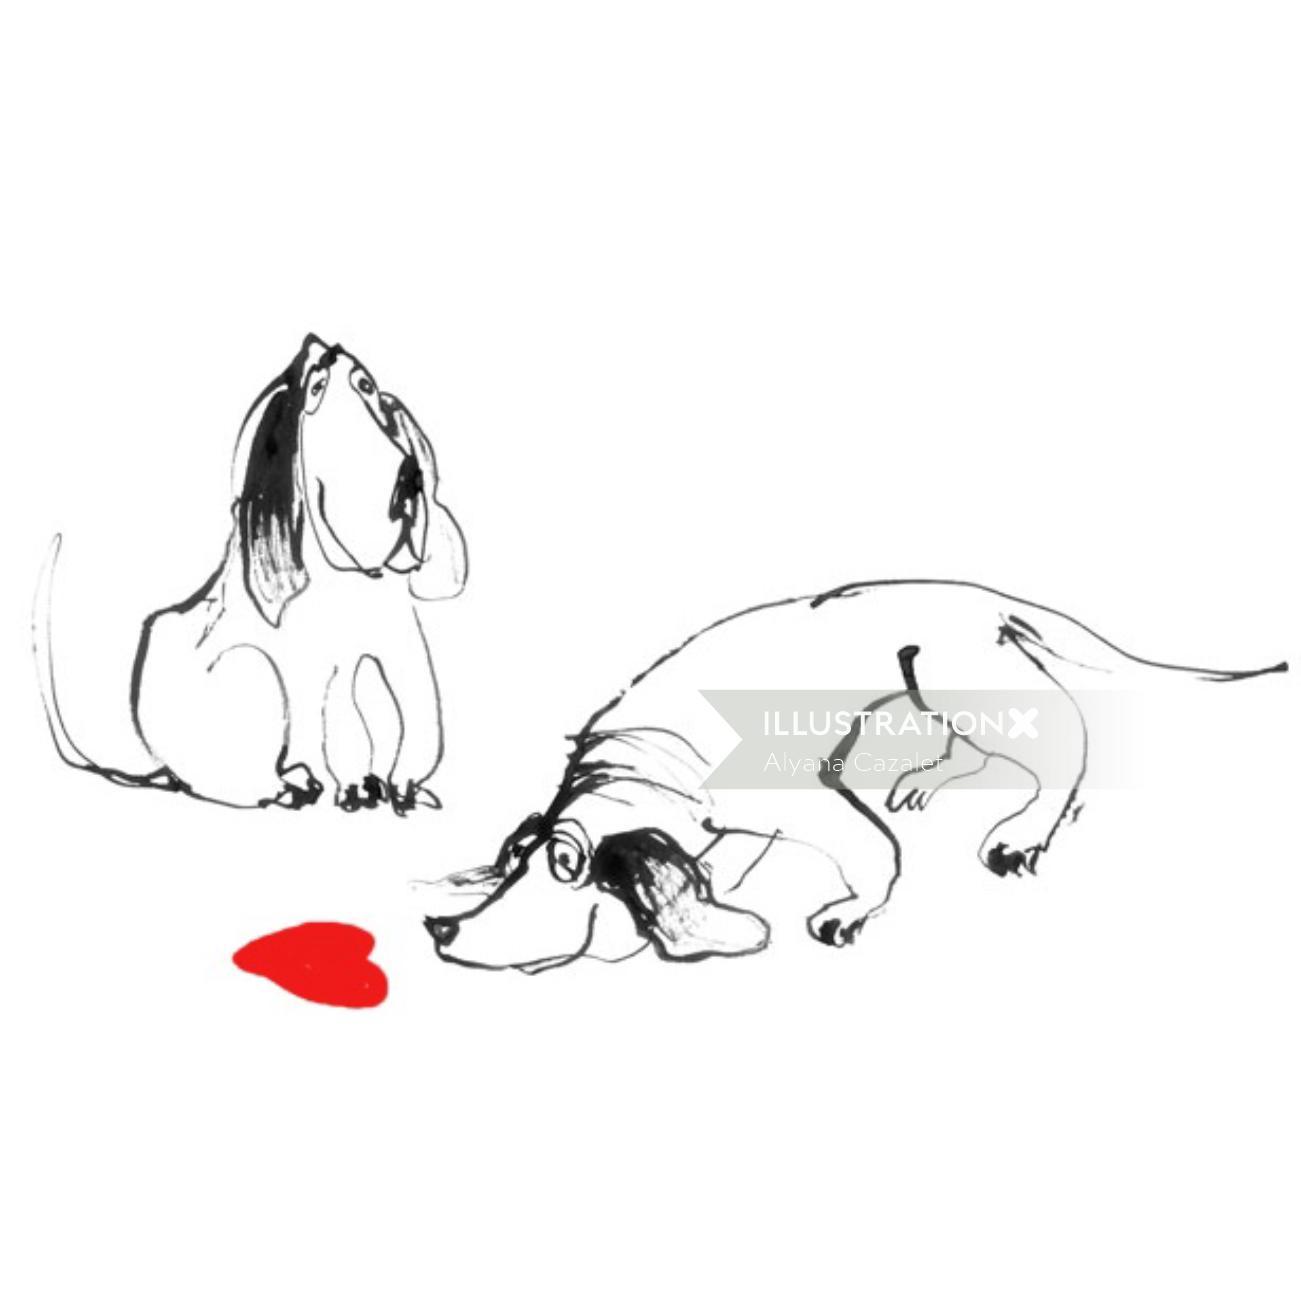 Cartoon dogs illustration by Alyana Cazalet